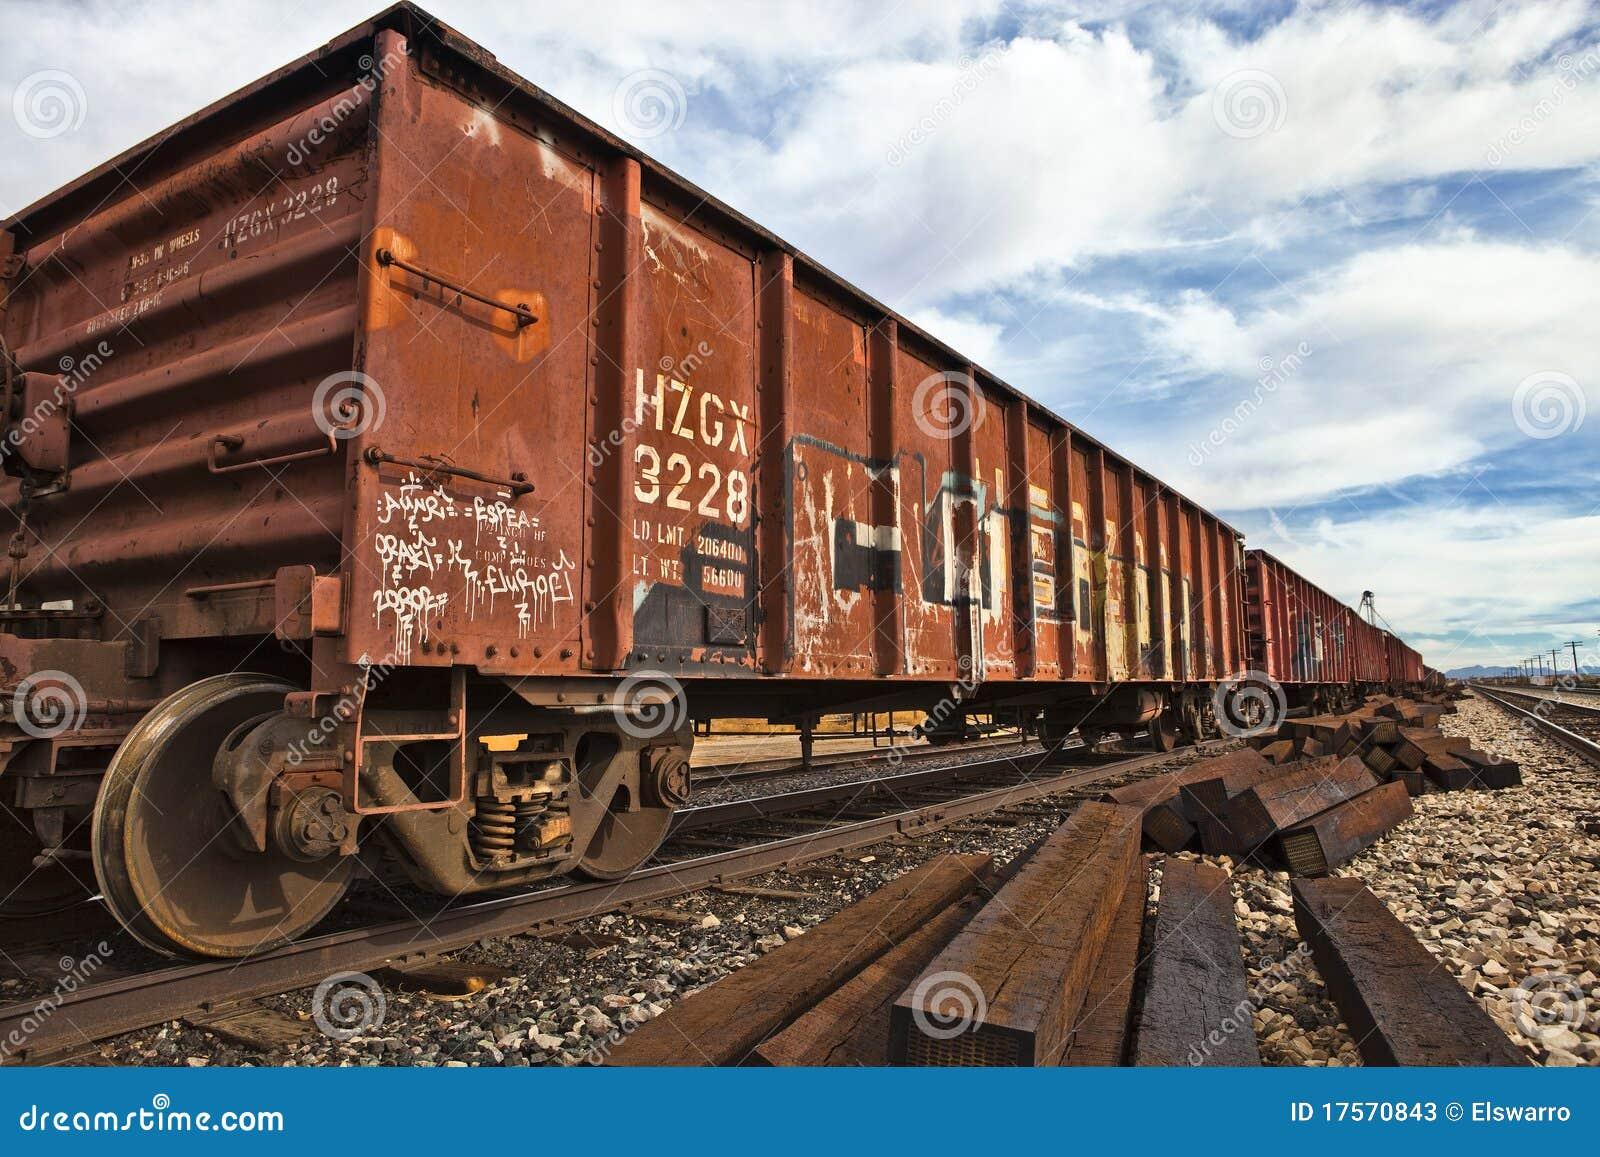 Railroad Cars Stock Image. Image Of Down, Color, Arizona